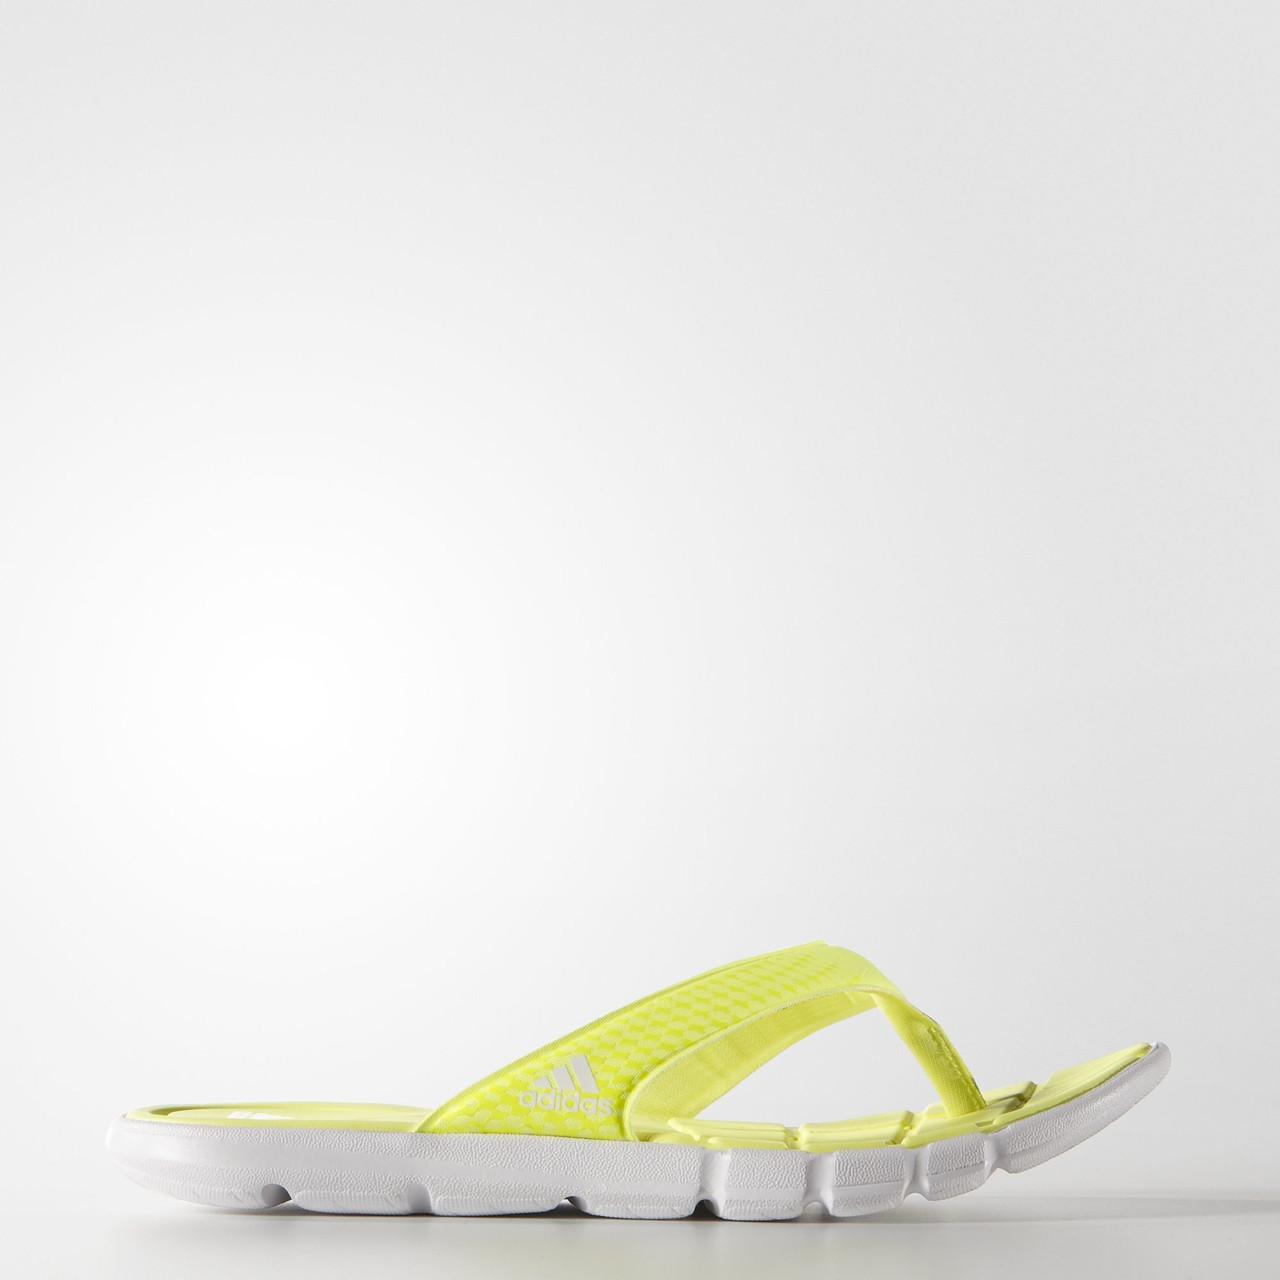 de520b8a7332 Женские шлепанцы adidas adipure 360 Thongs (Артикул: B44484)